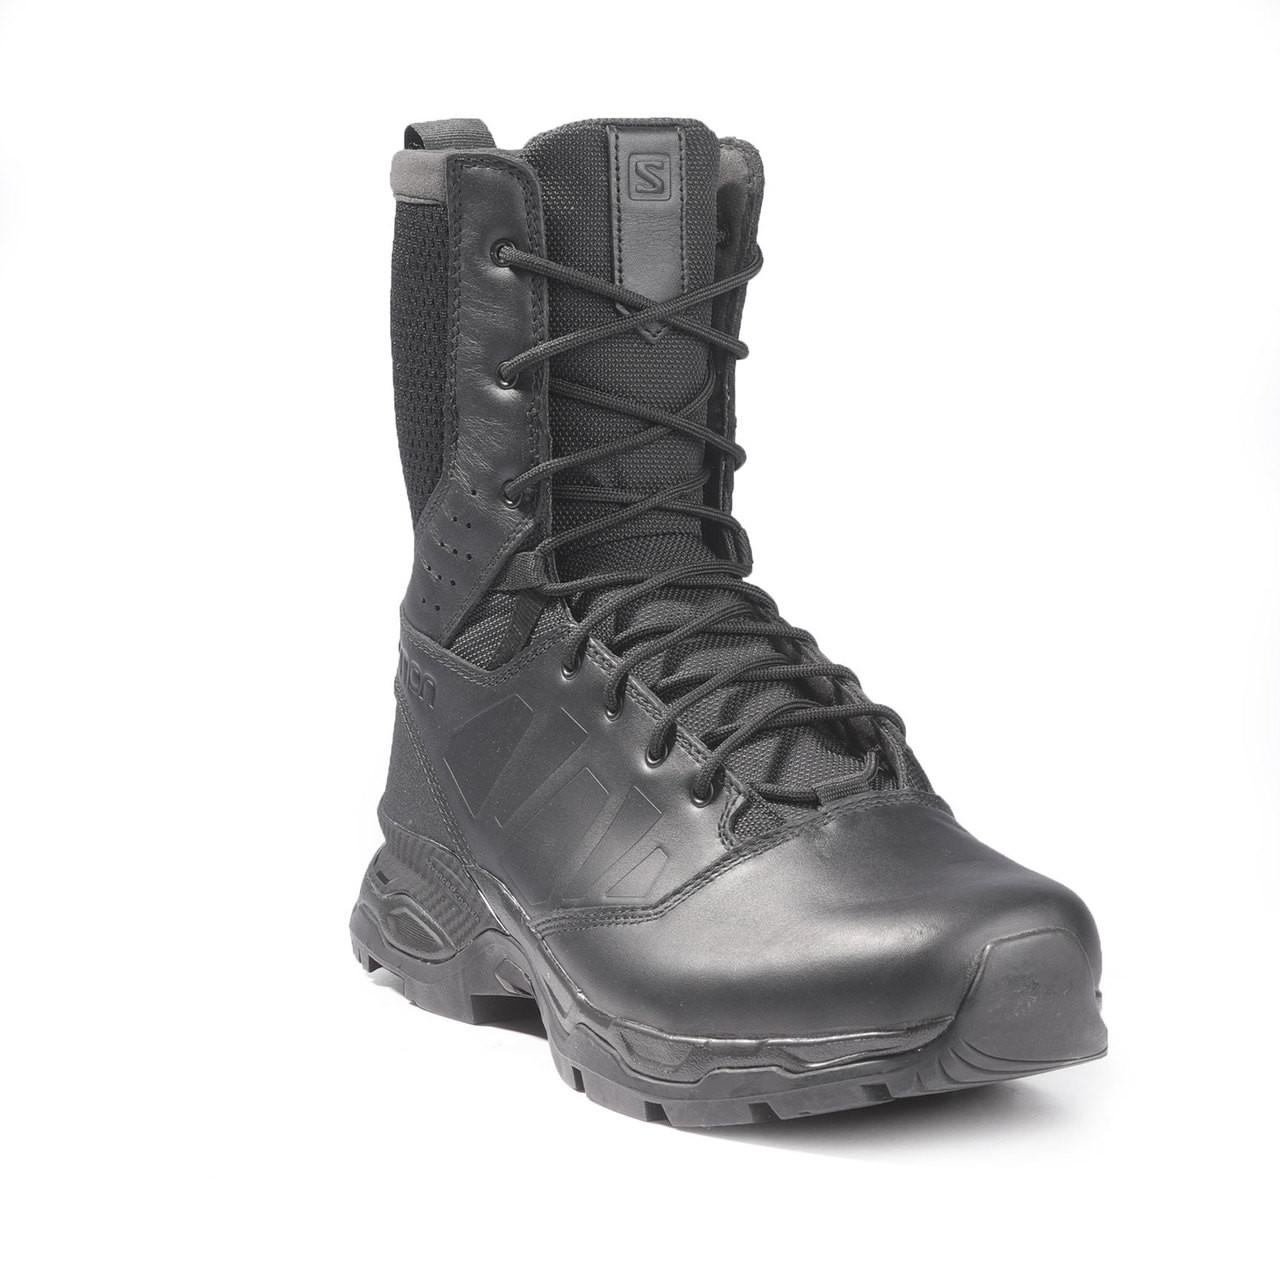 Salomon Forces Jungle Ultra Boots